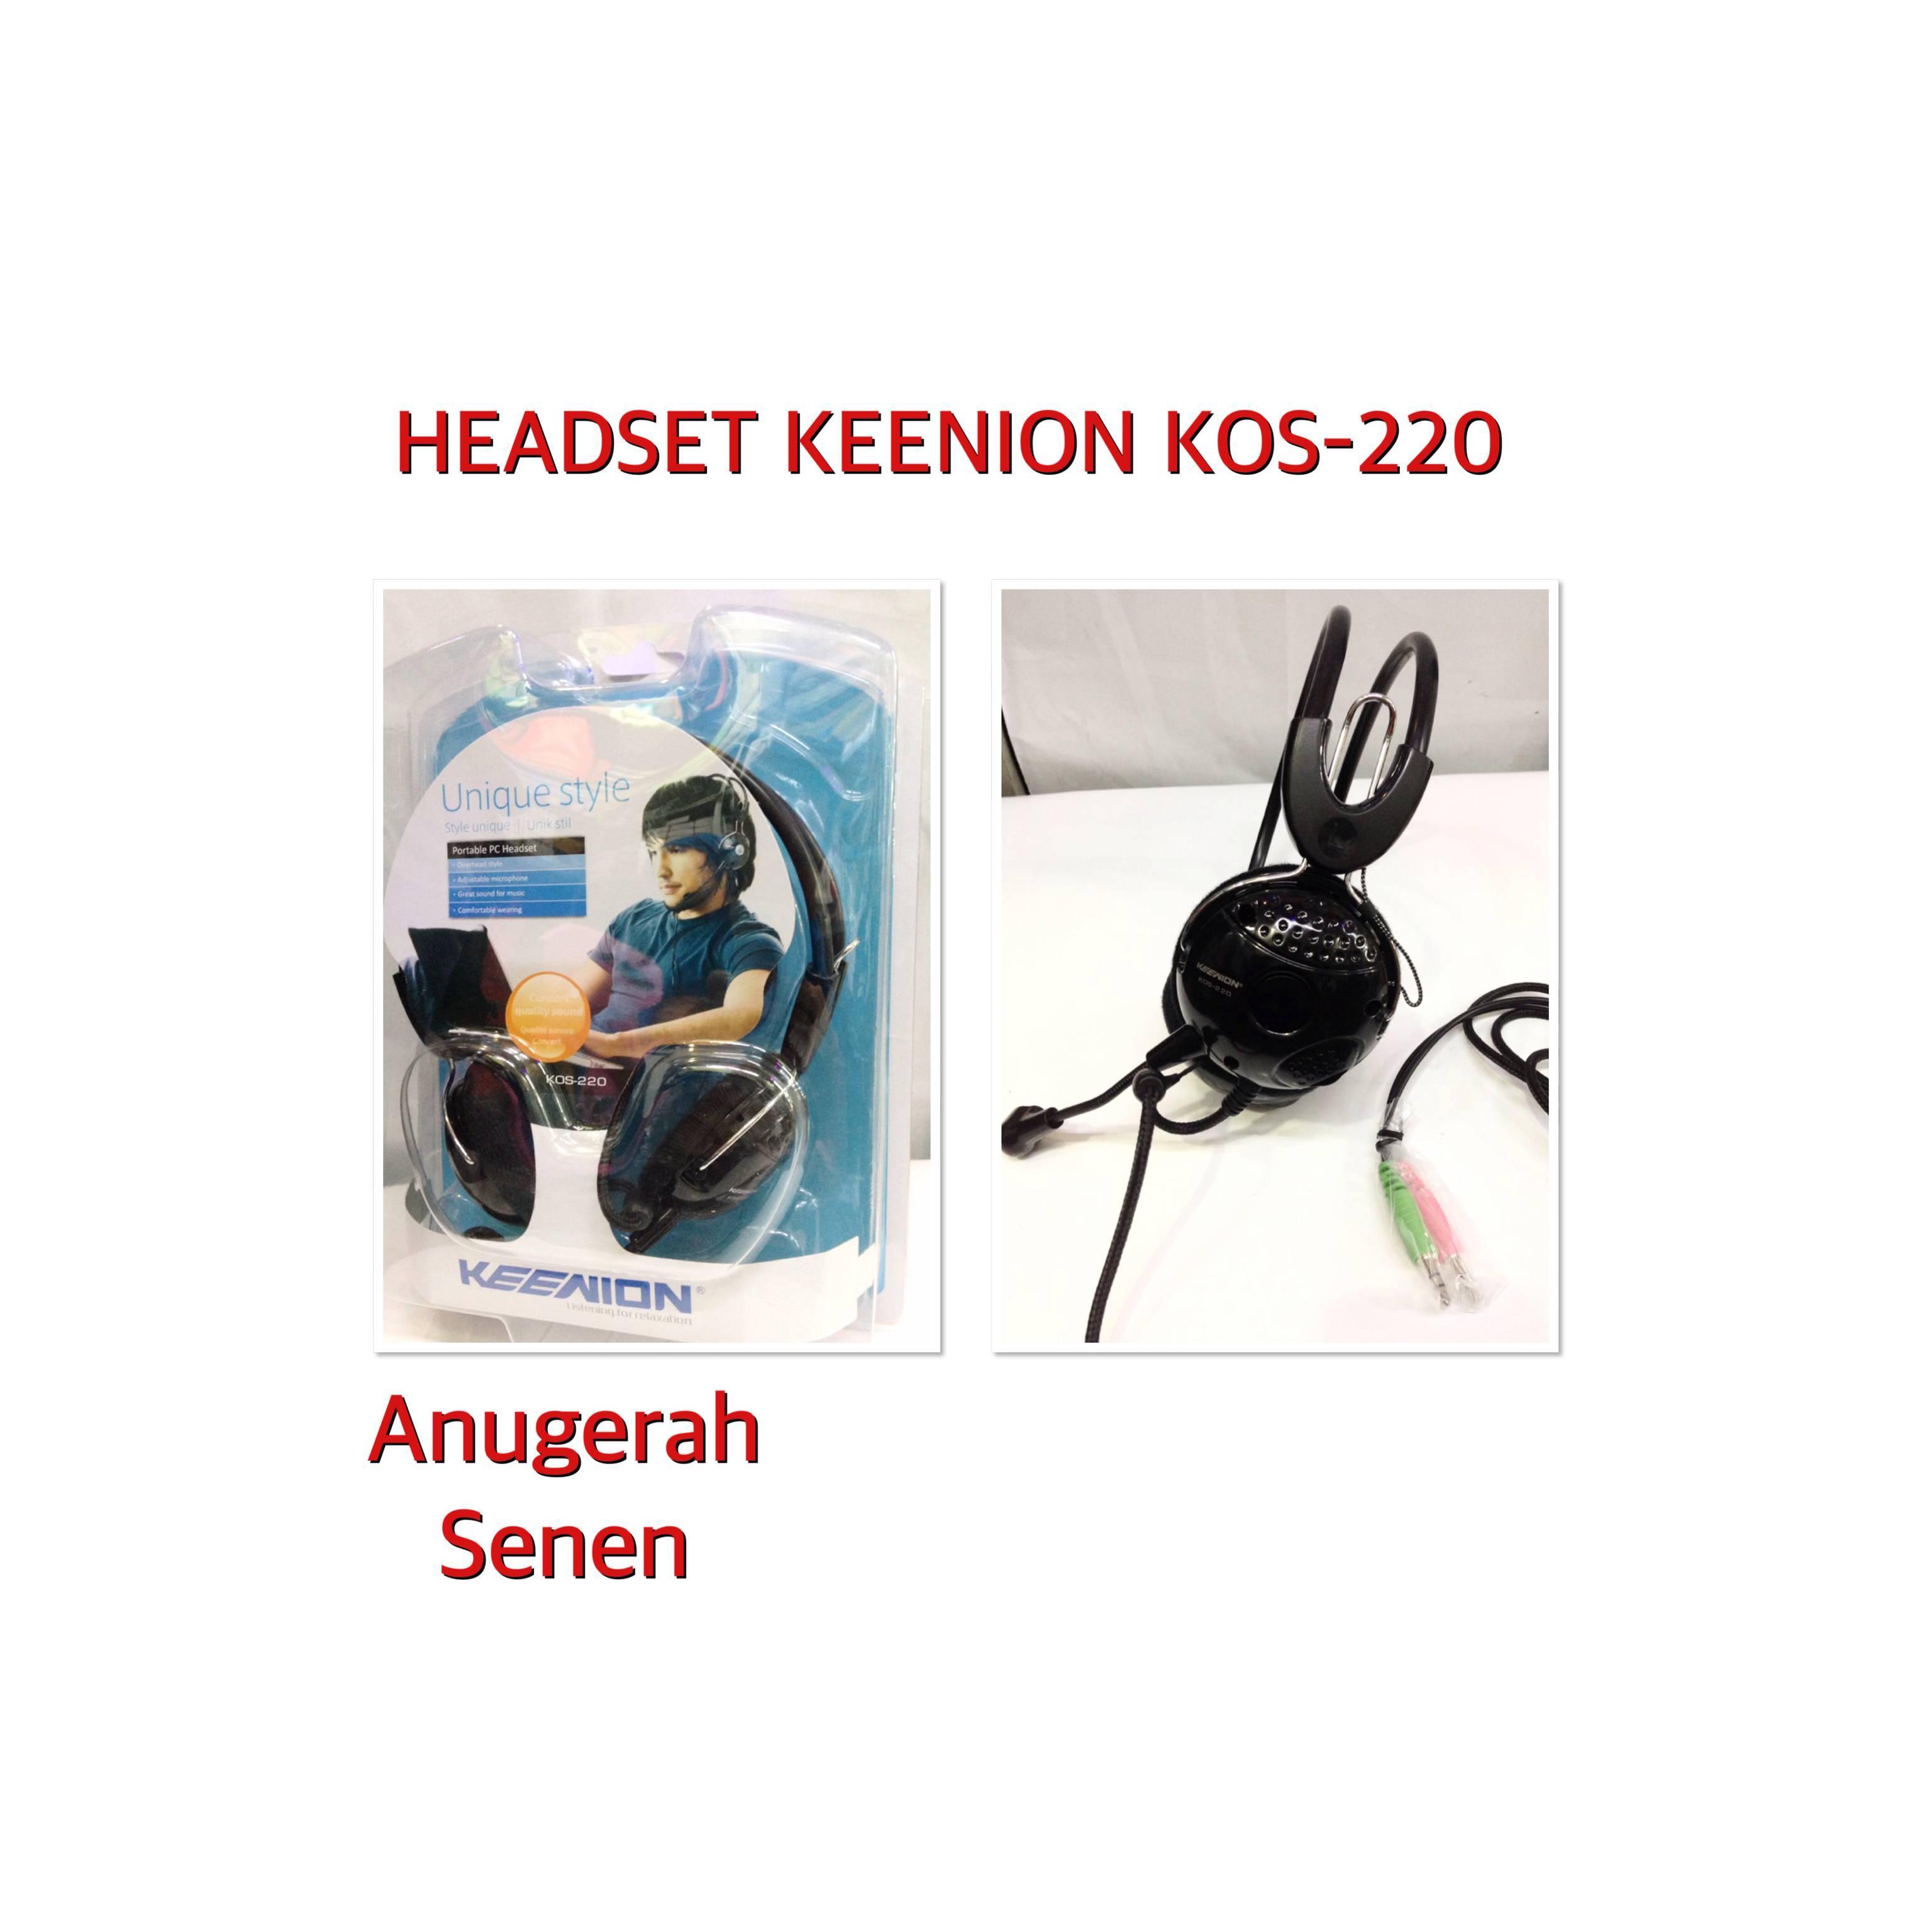 Keenion Headset Super Gaming Kos 220 Hitam Daftar Update Harga 803 Headphone Original Blue 220idr88000 Rp 88000